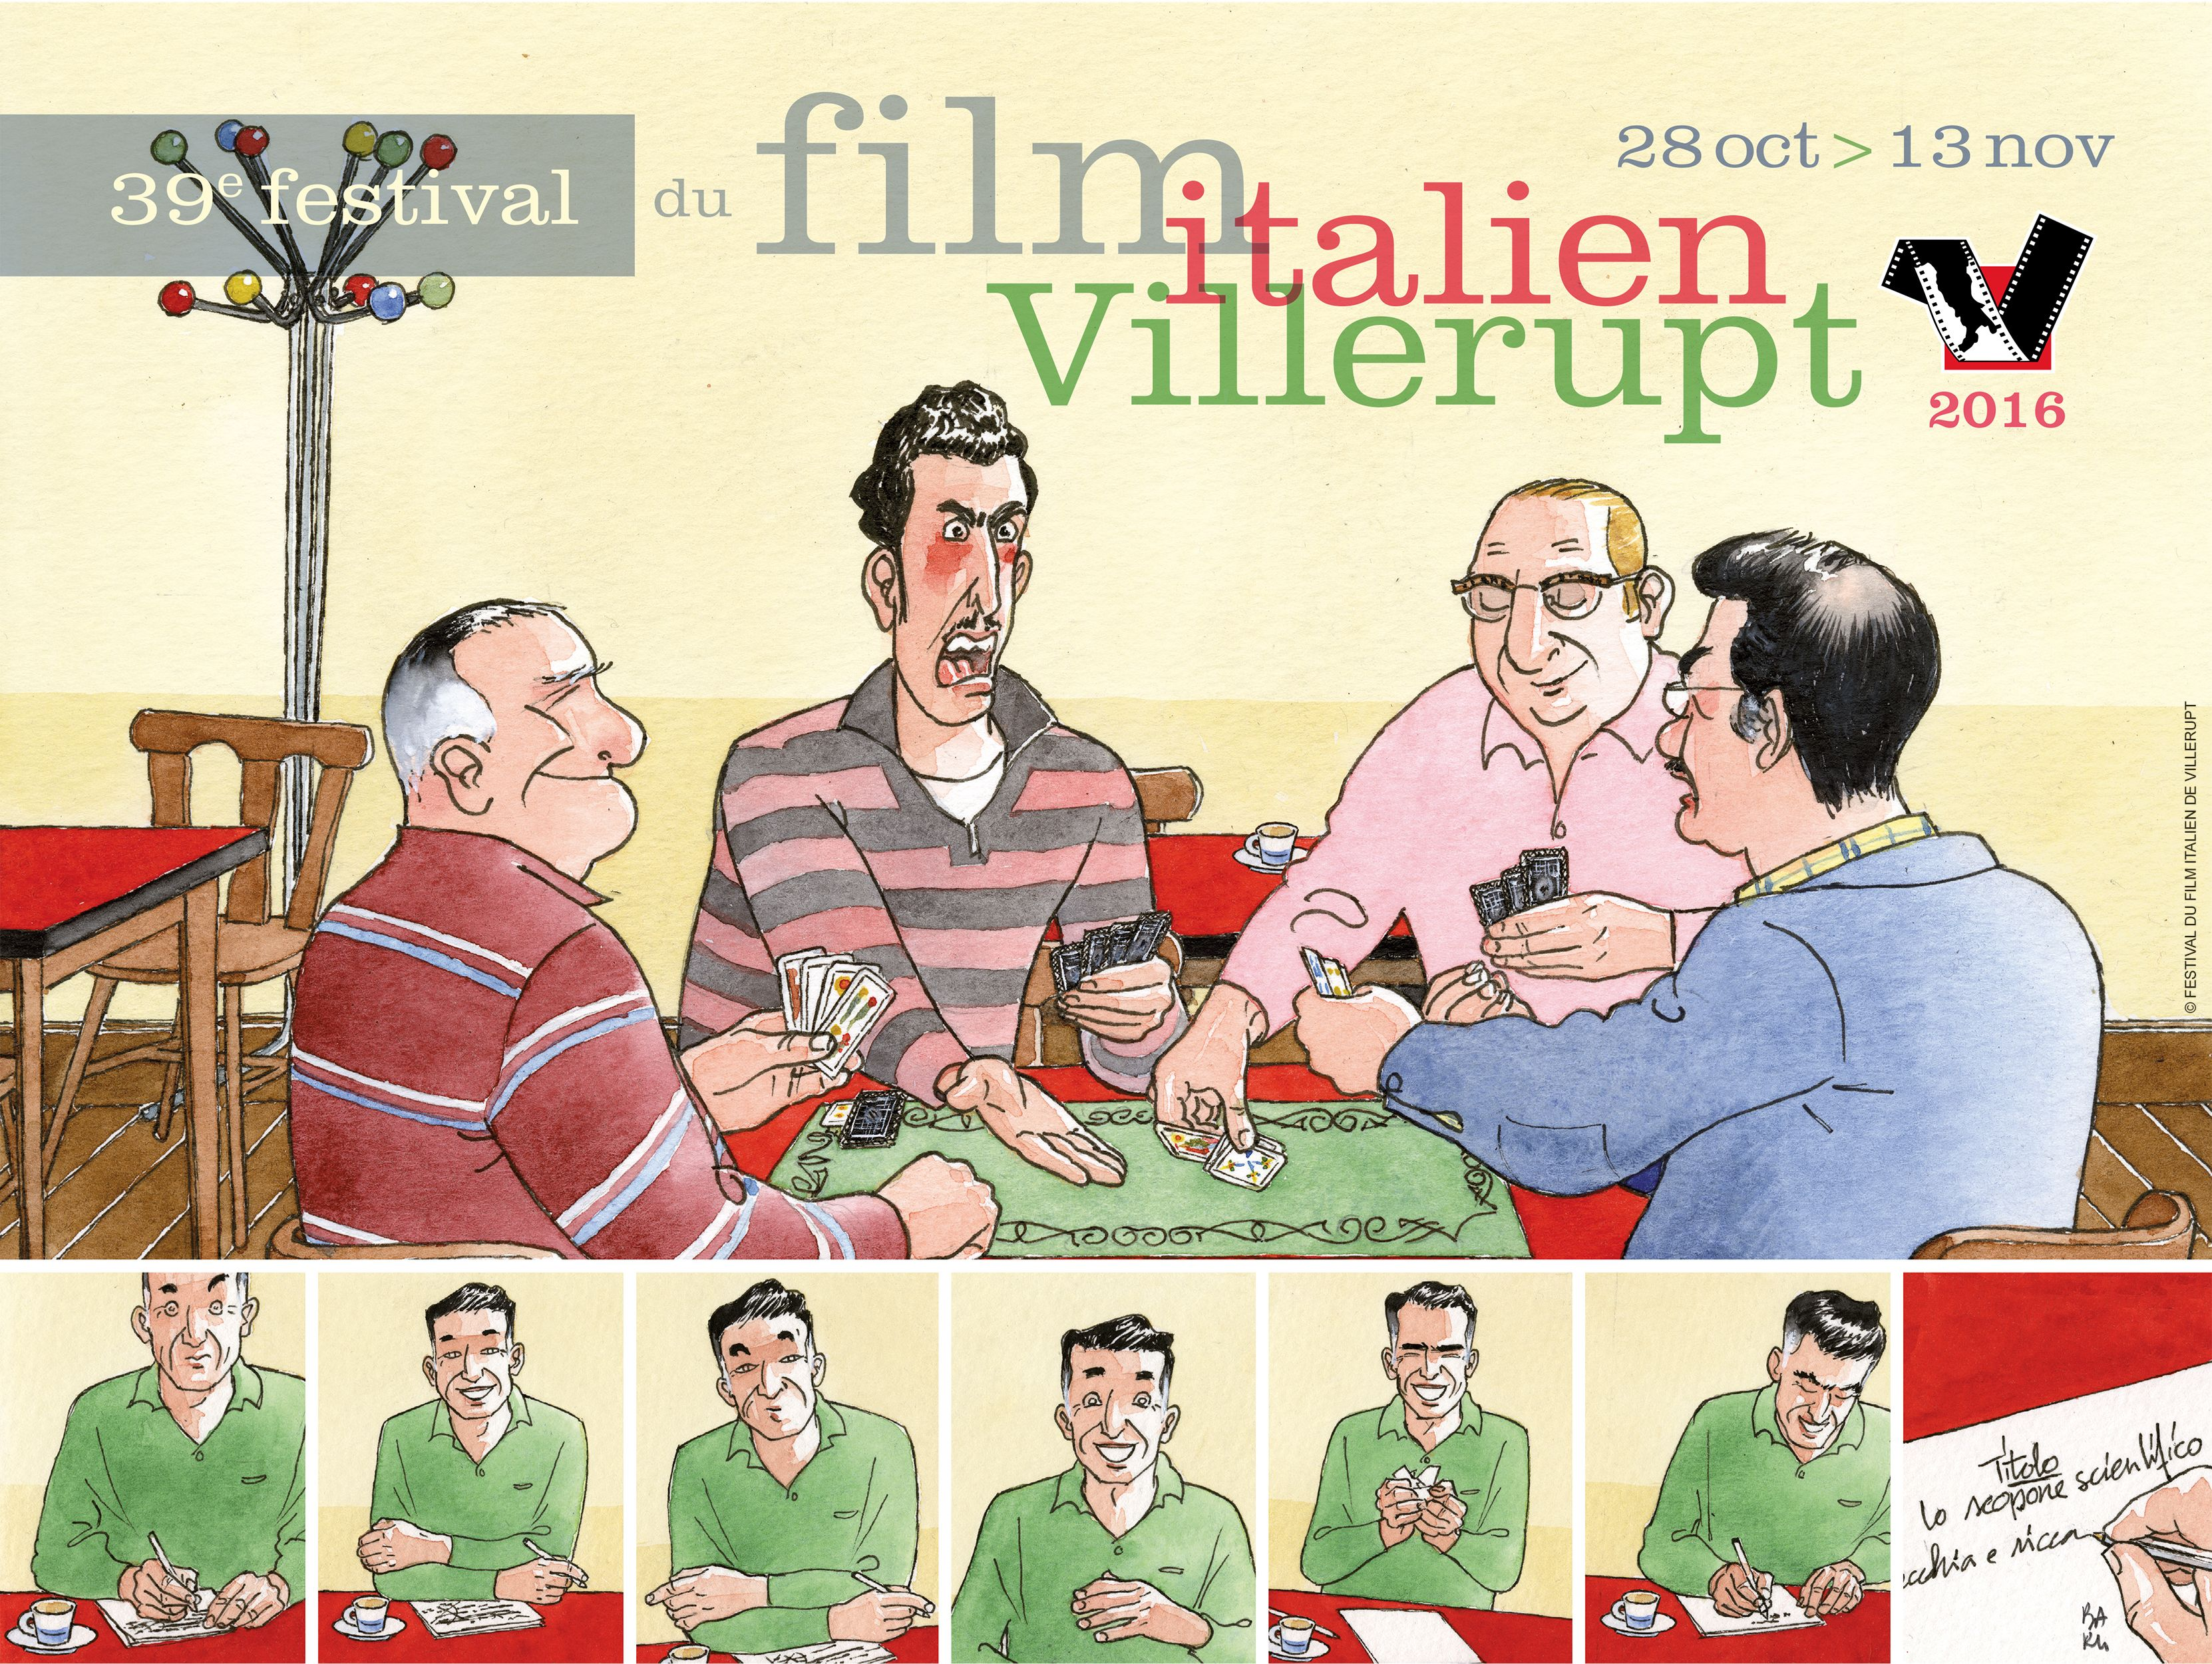 festival du film italien de villerupt nancy 2016